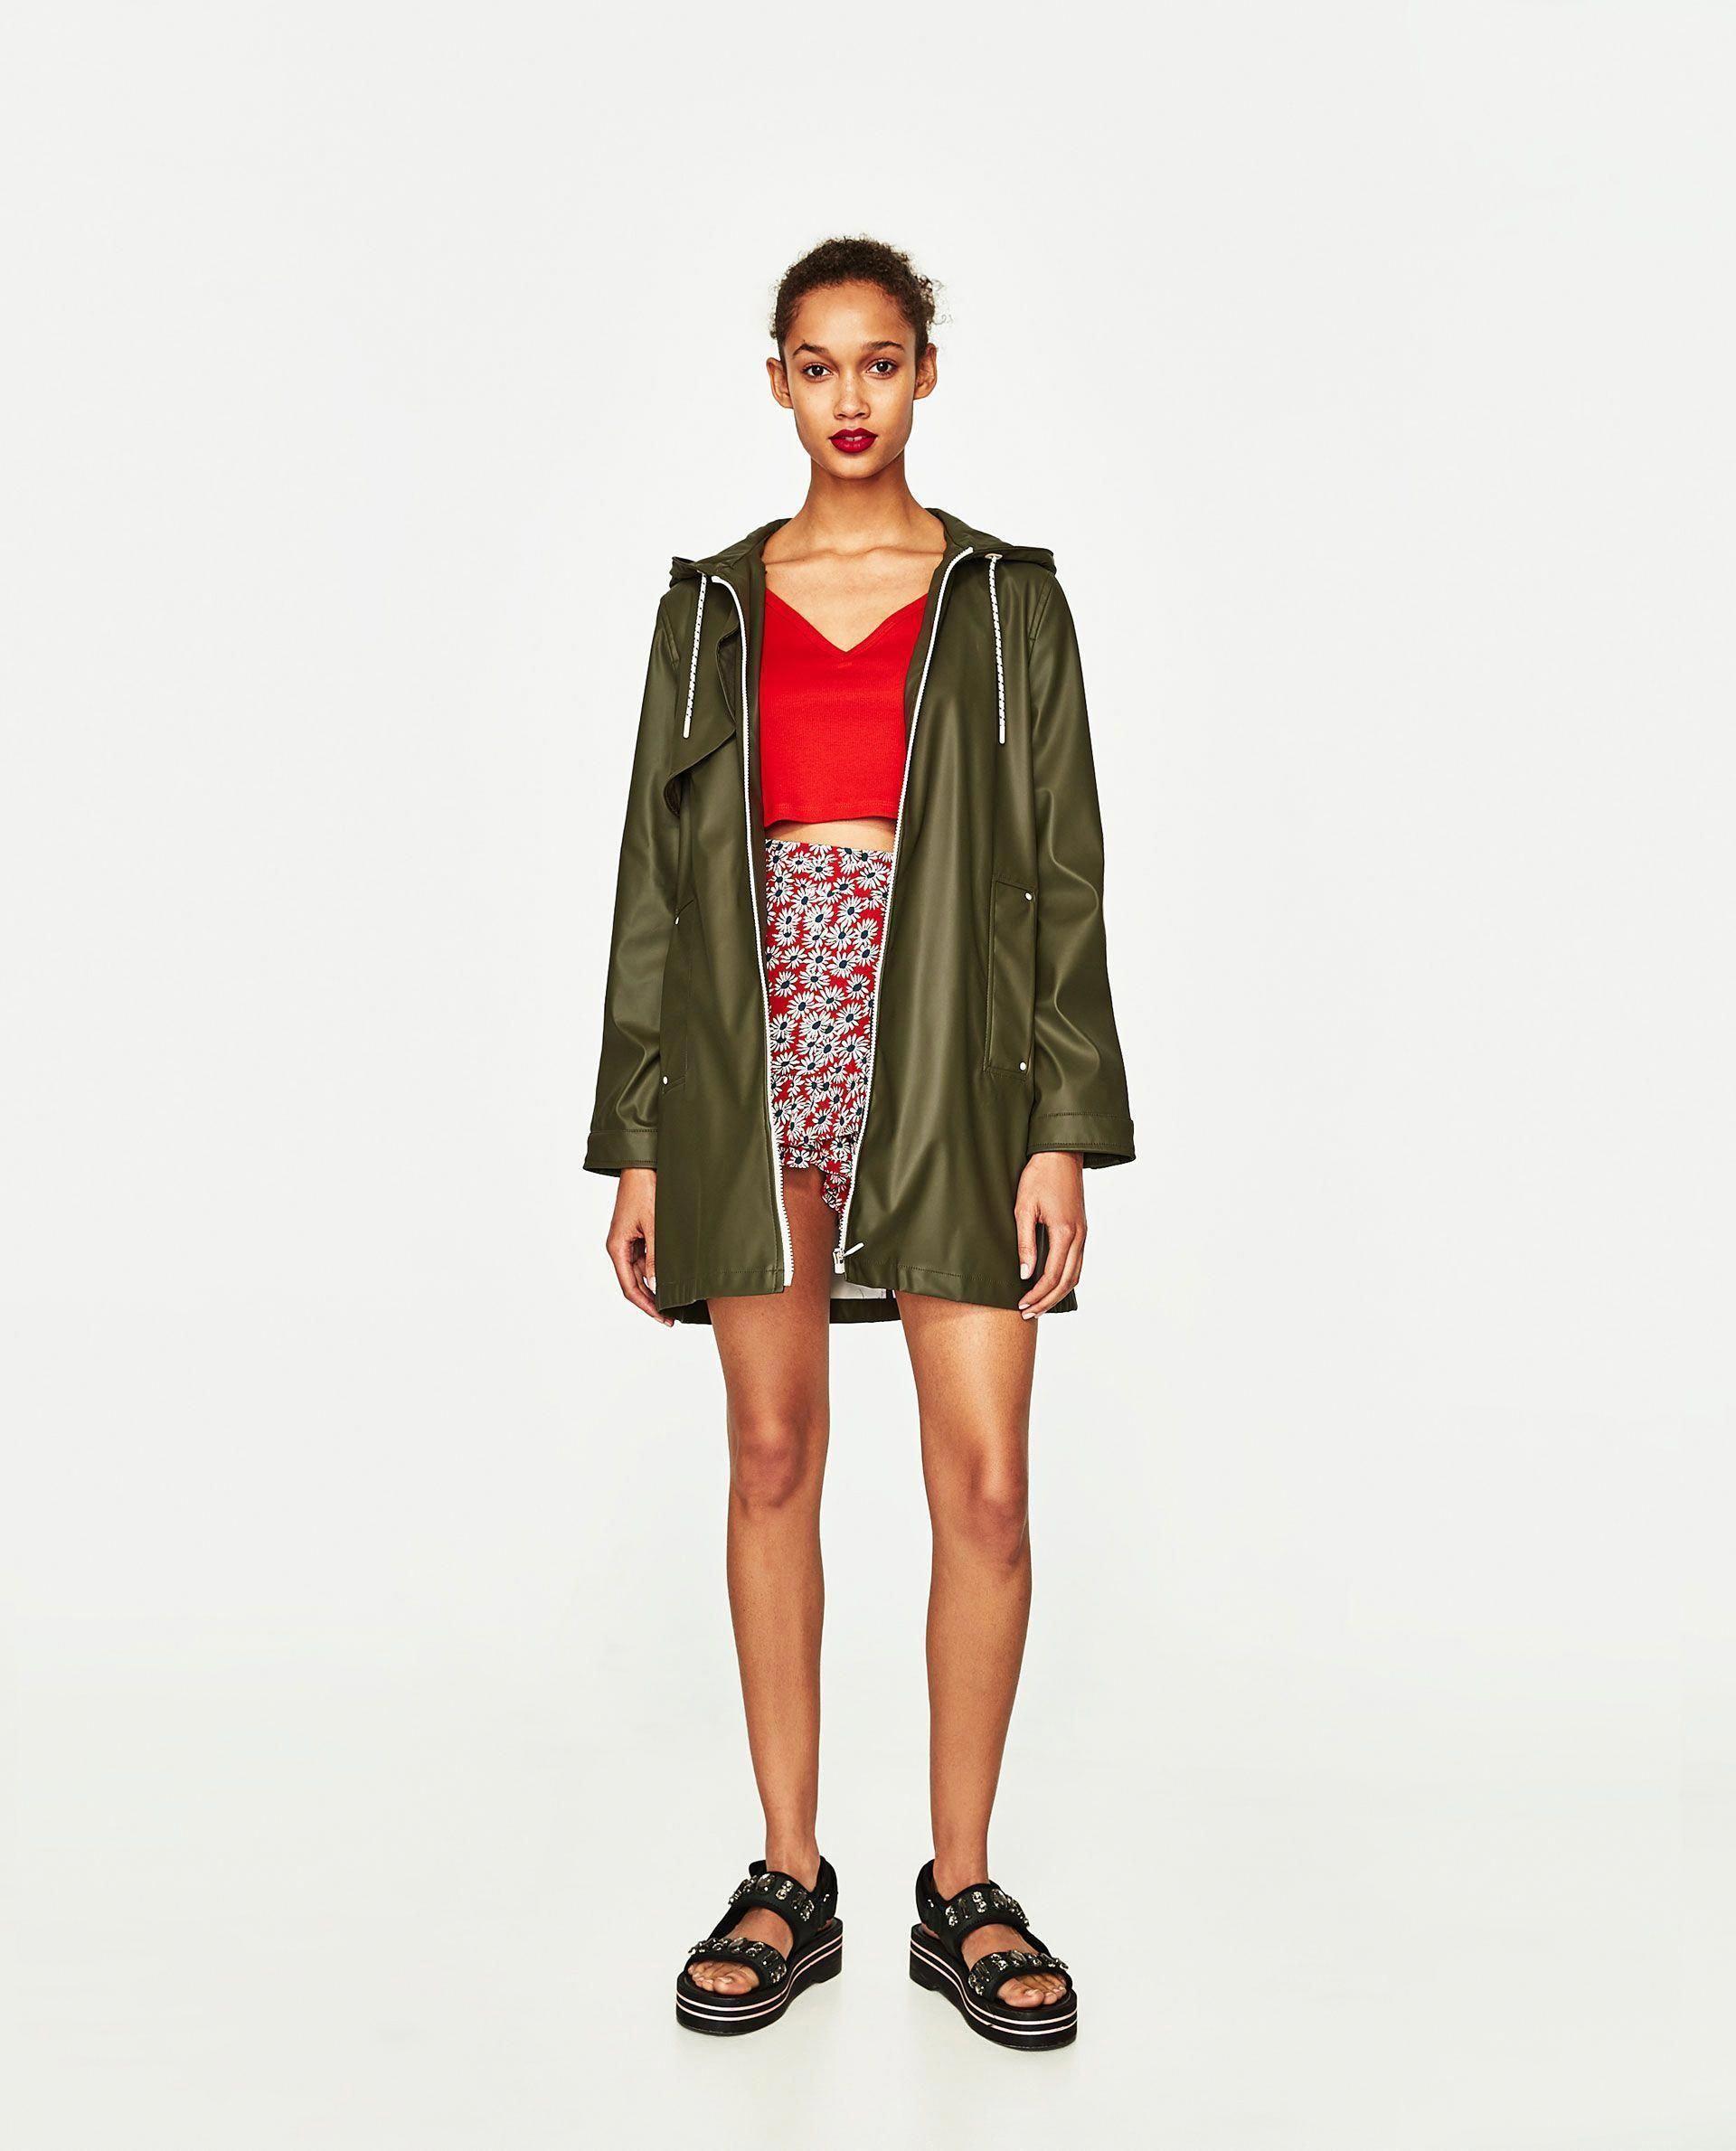 Summer Mae Womens Long Hooded Rain Jacket Waterproof Lightweight Raincoat Windbreaker